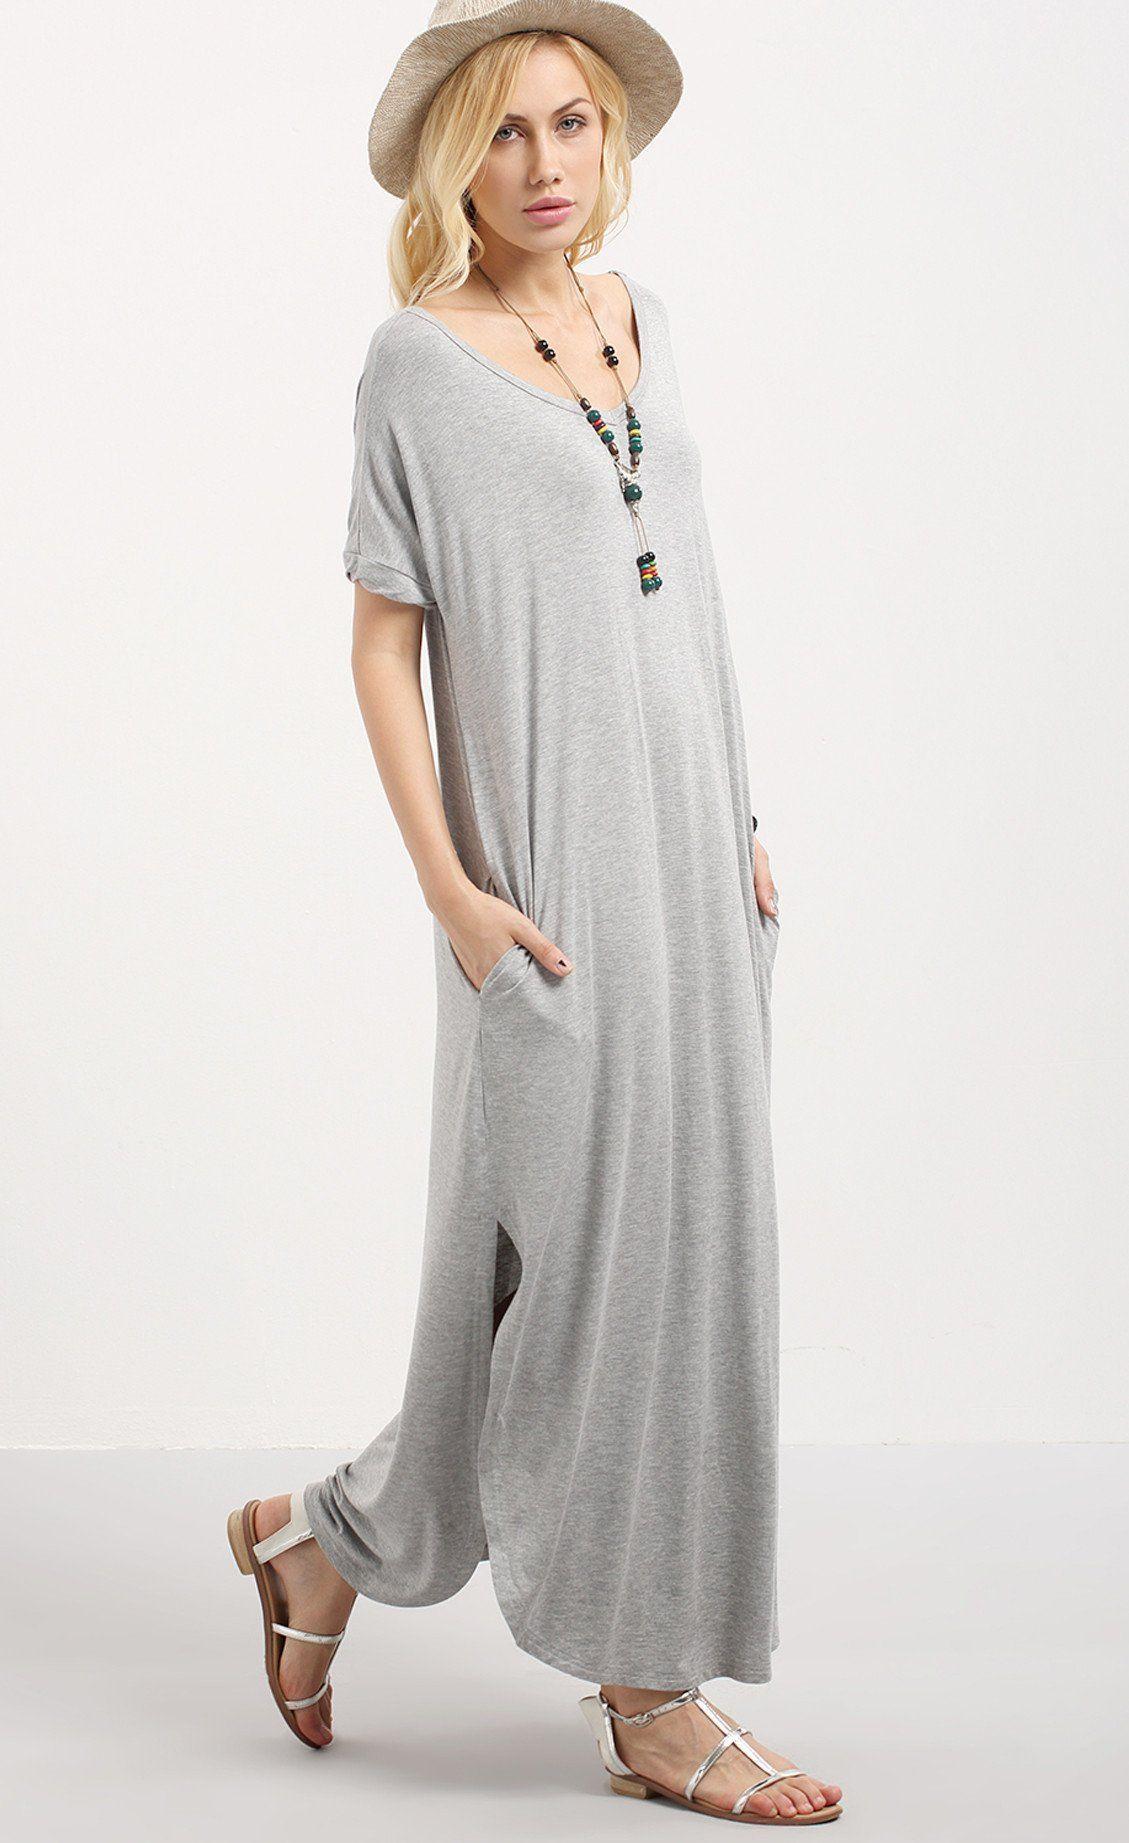 Abigail Grey T Shirt Maxi Dress Womens Maxi Dresses Grey Maxi Dress Maxi Knit Dress [ 1843 x 1129 Pixel ]